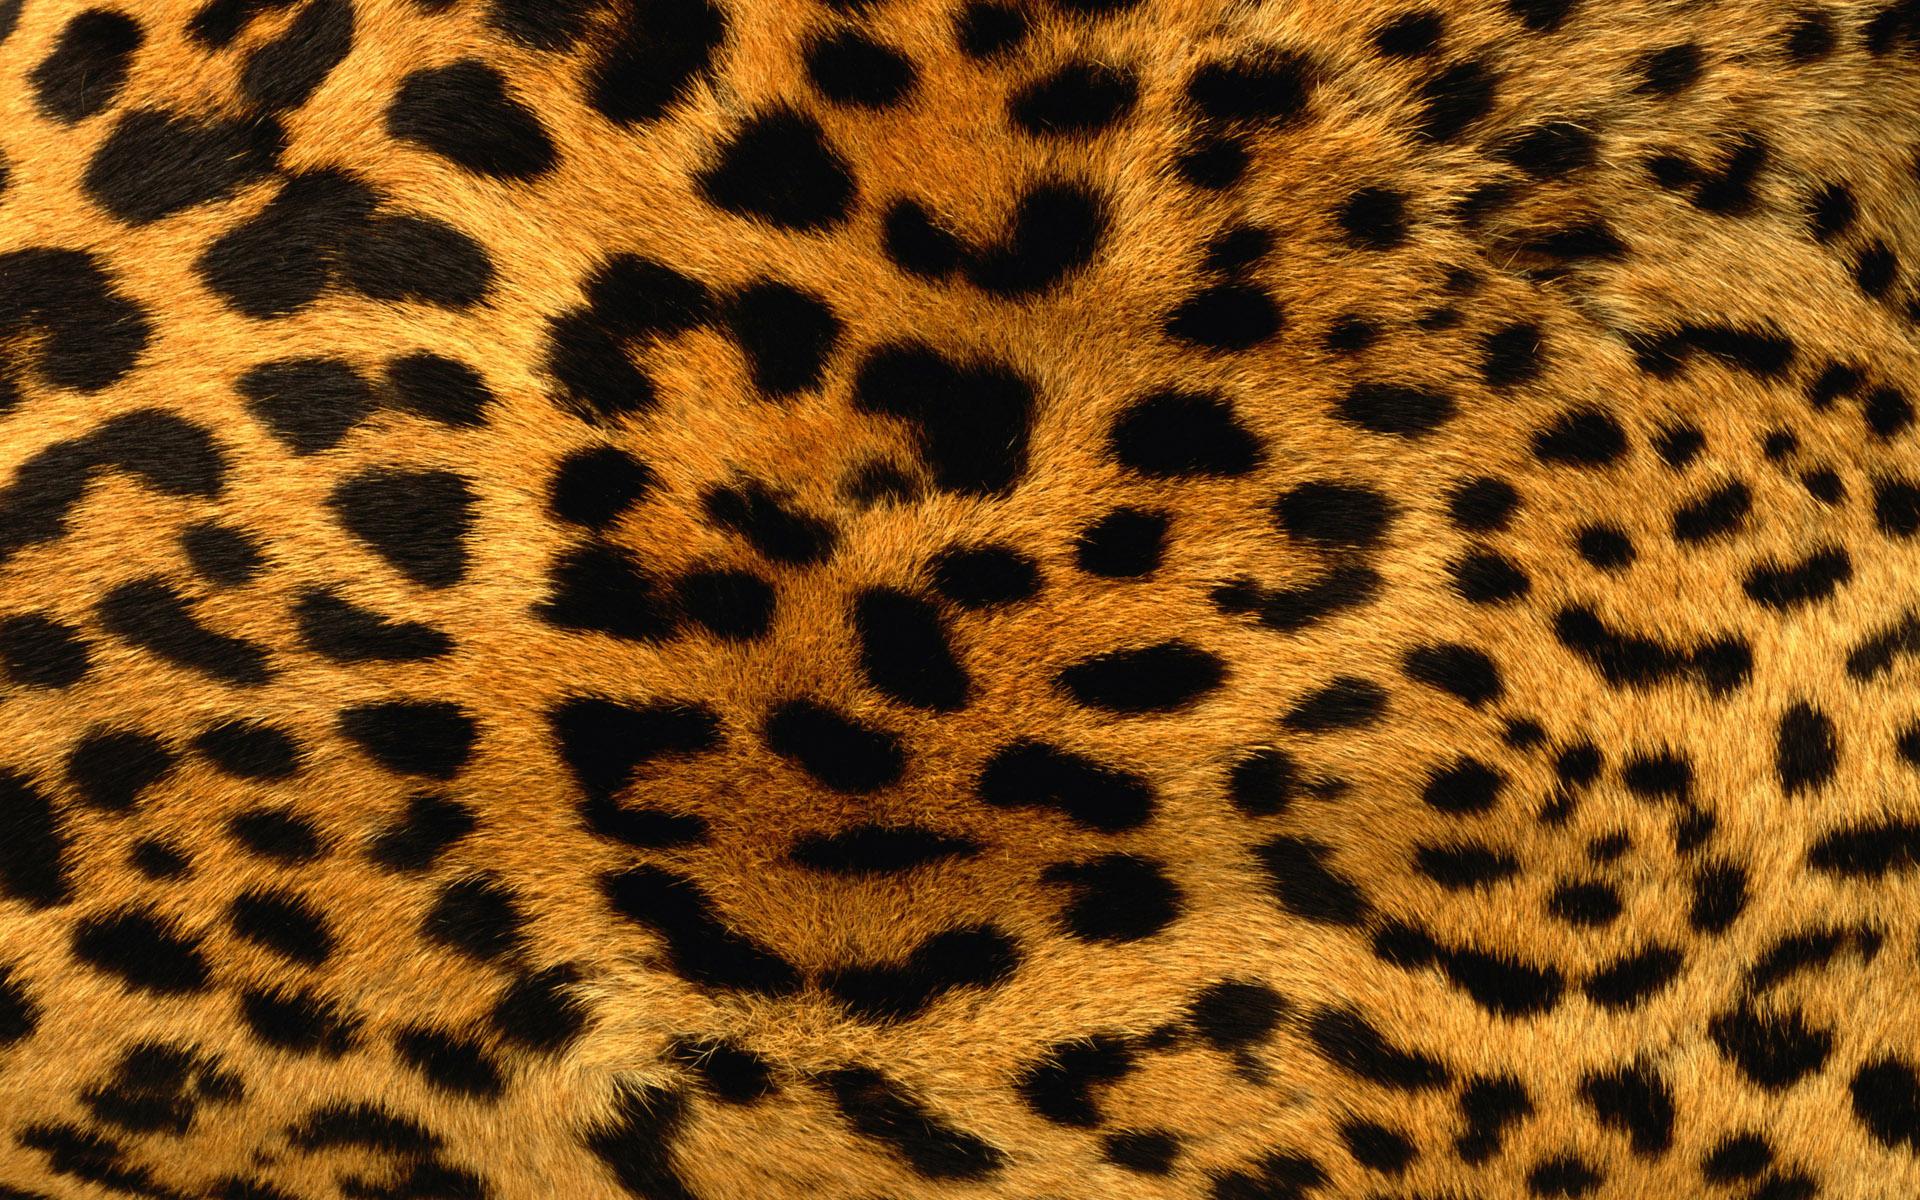 Leopard Print Wallpapers Leopard Print Myspace Backgrounds Leopard 1920x1200